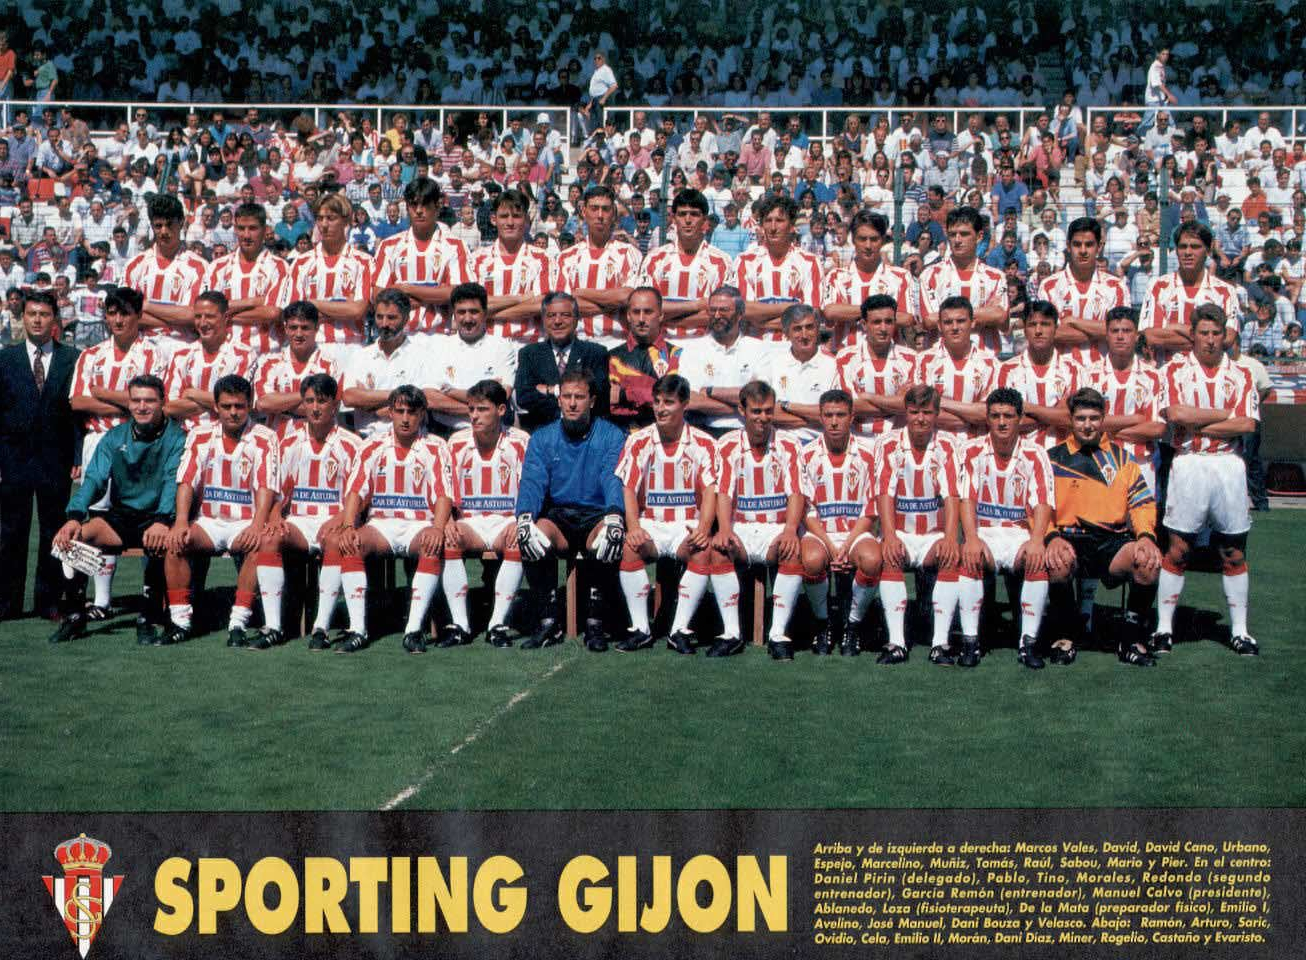 gijon sporting